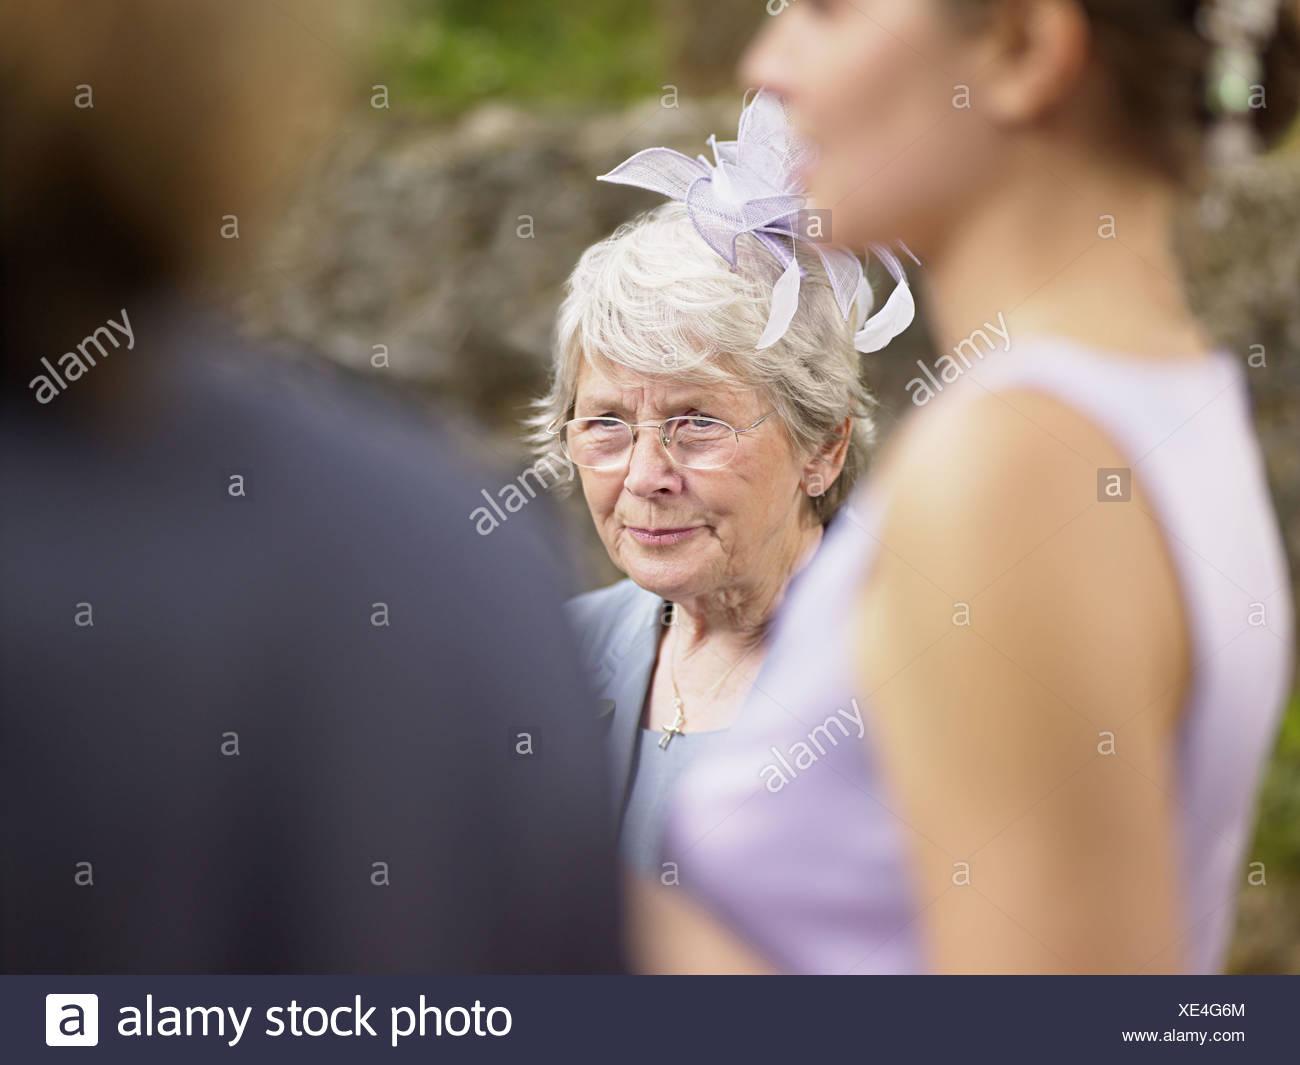 Guests at wedding - Stock Image